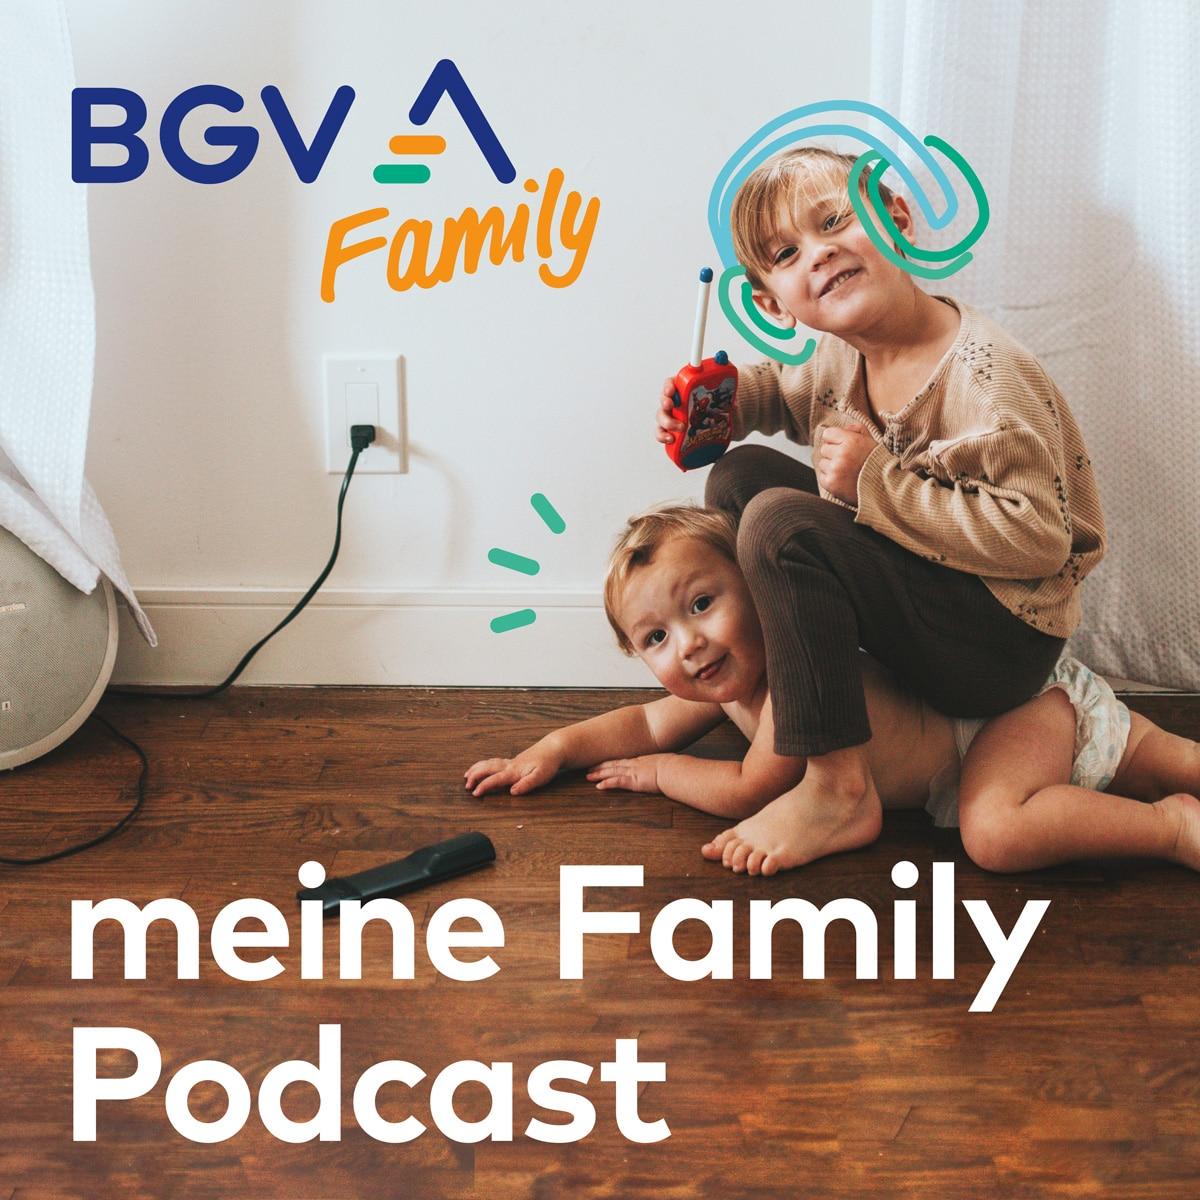 meine Family - Der BGV Podcast